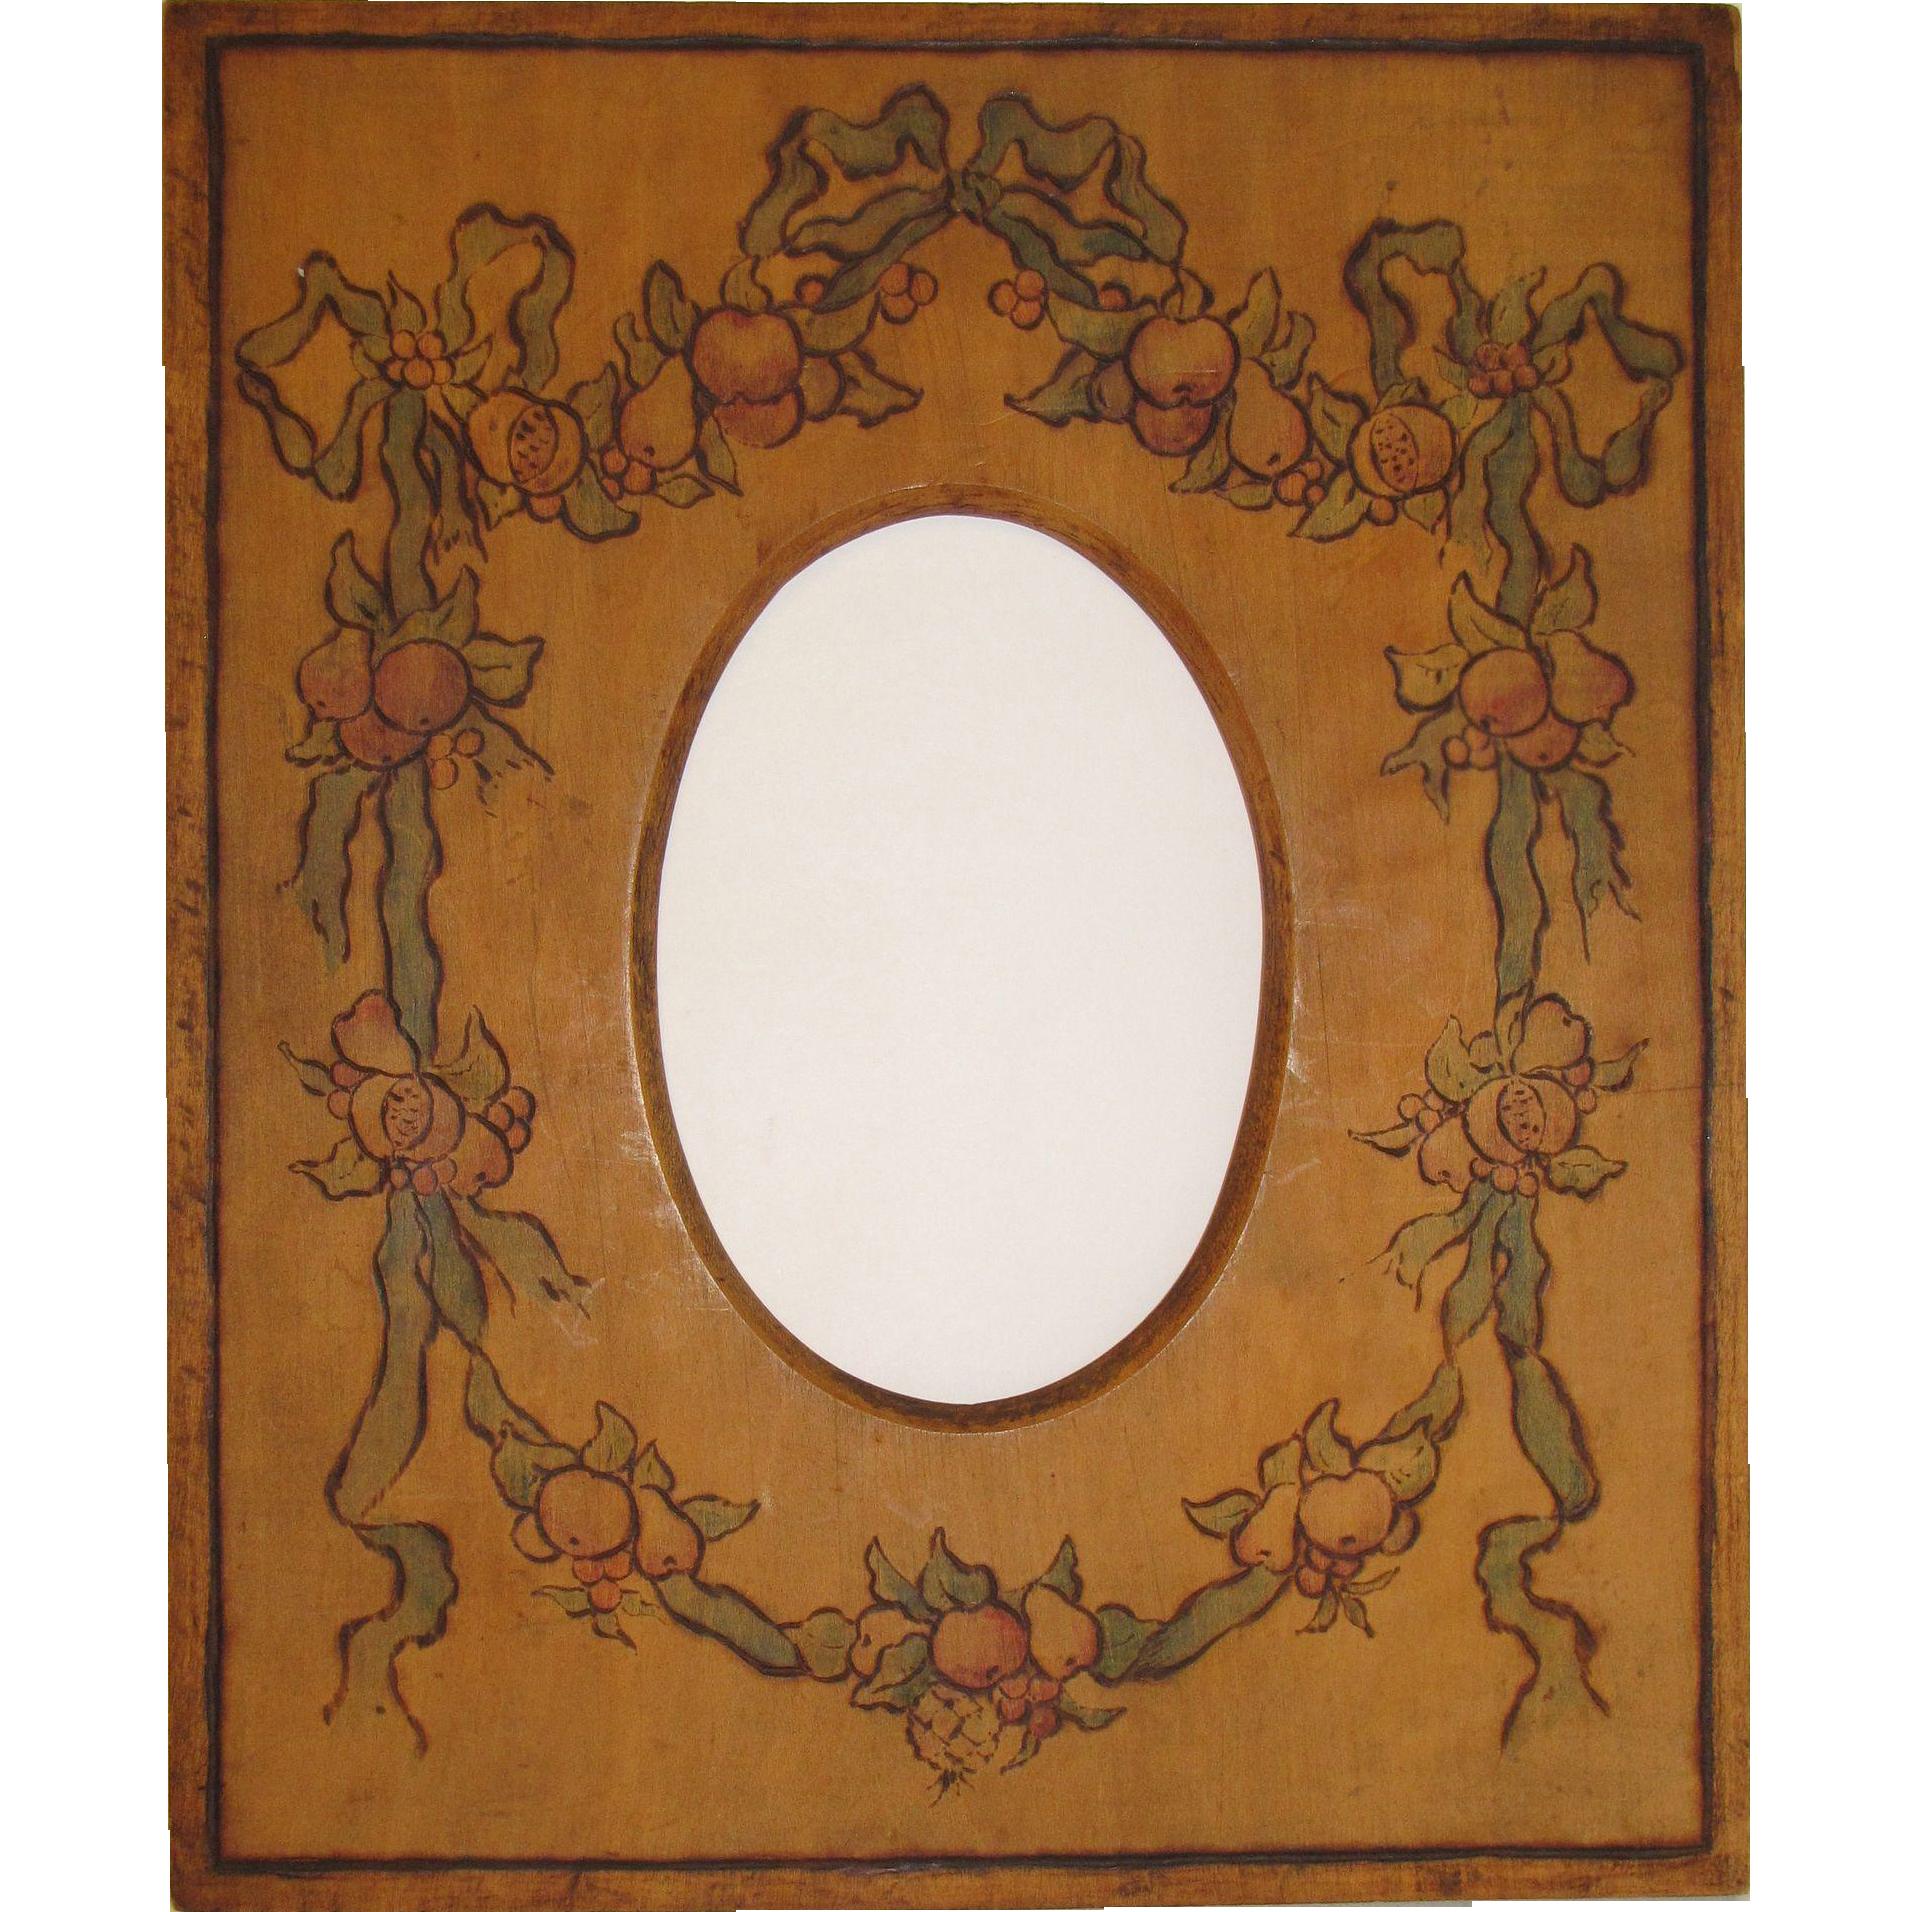 Vintage Pyrography Photograph Frame, Della Robbia Design